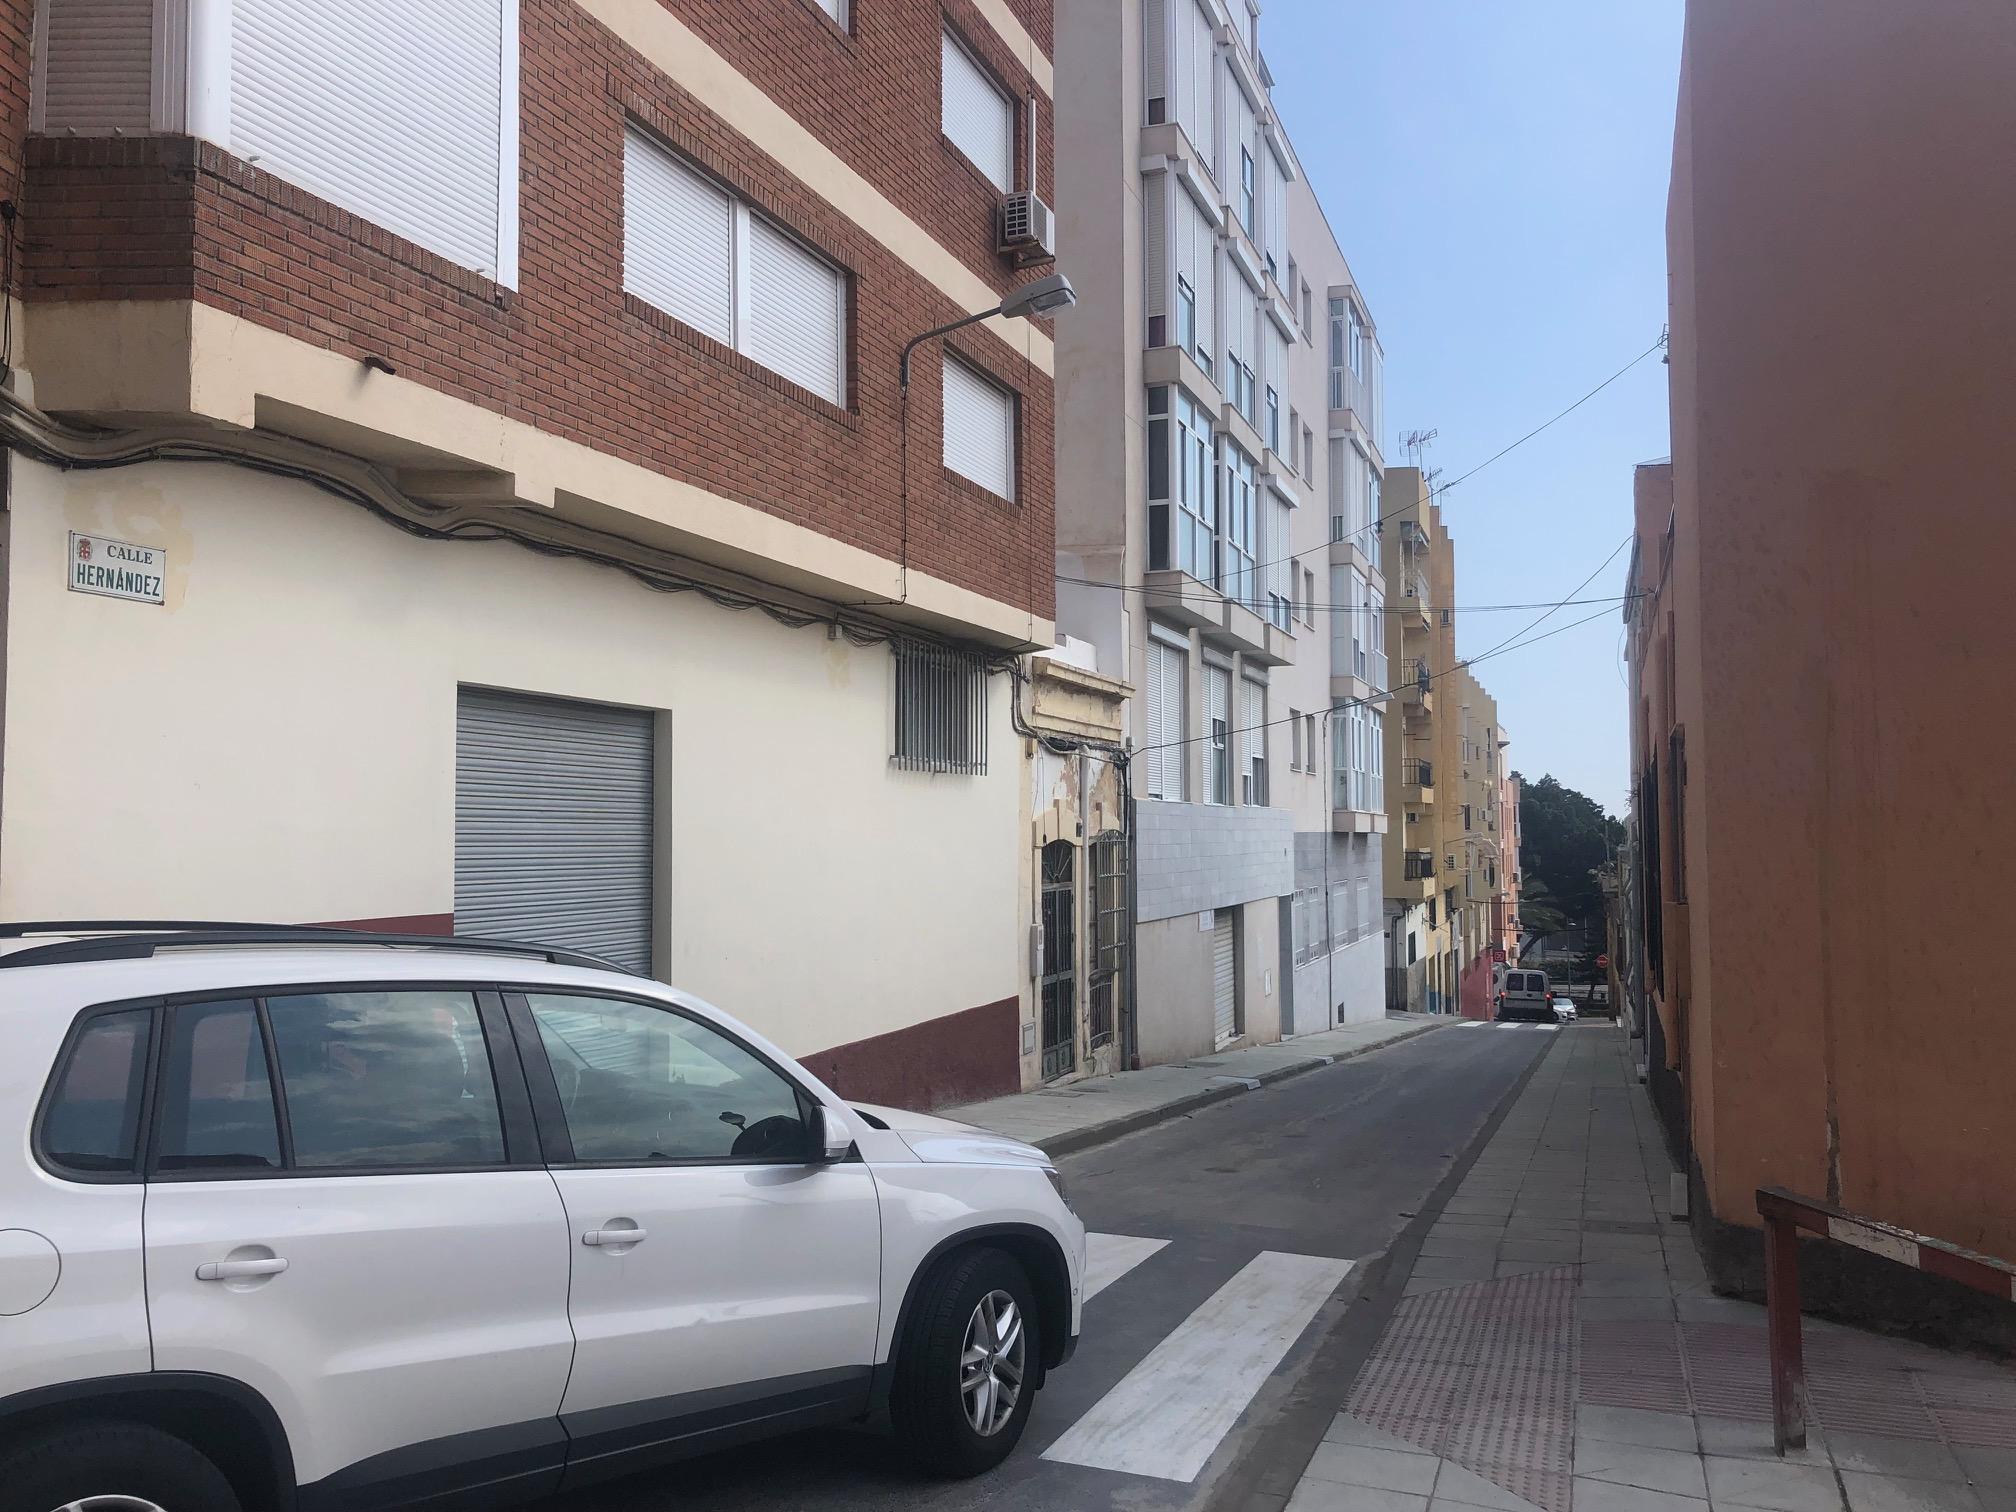 Apertura calle Hernandez